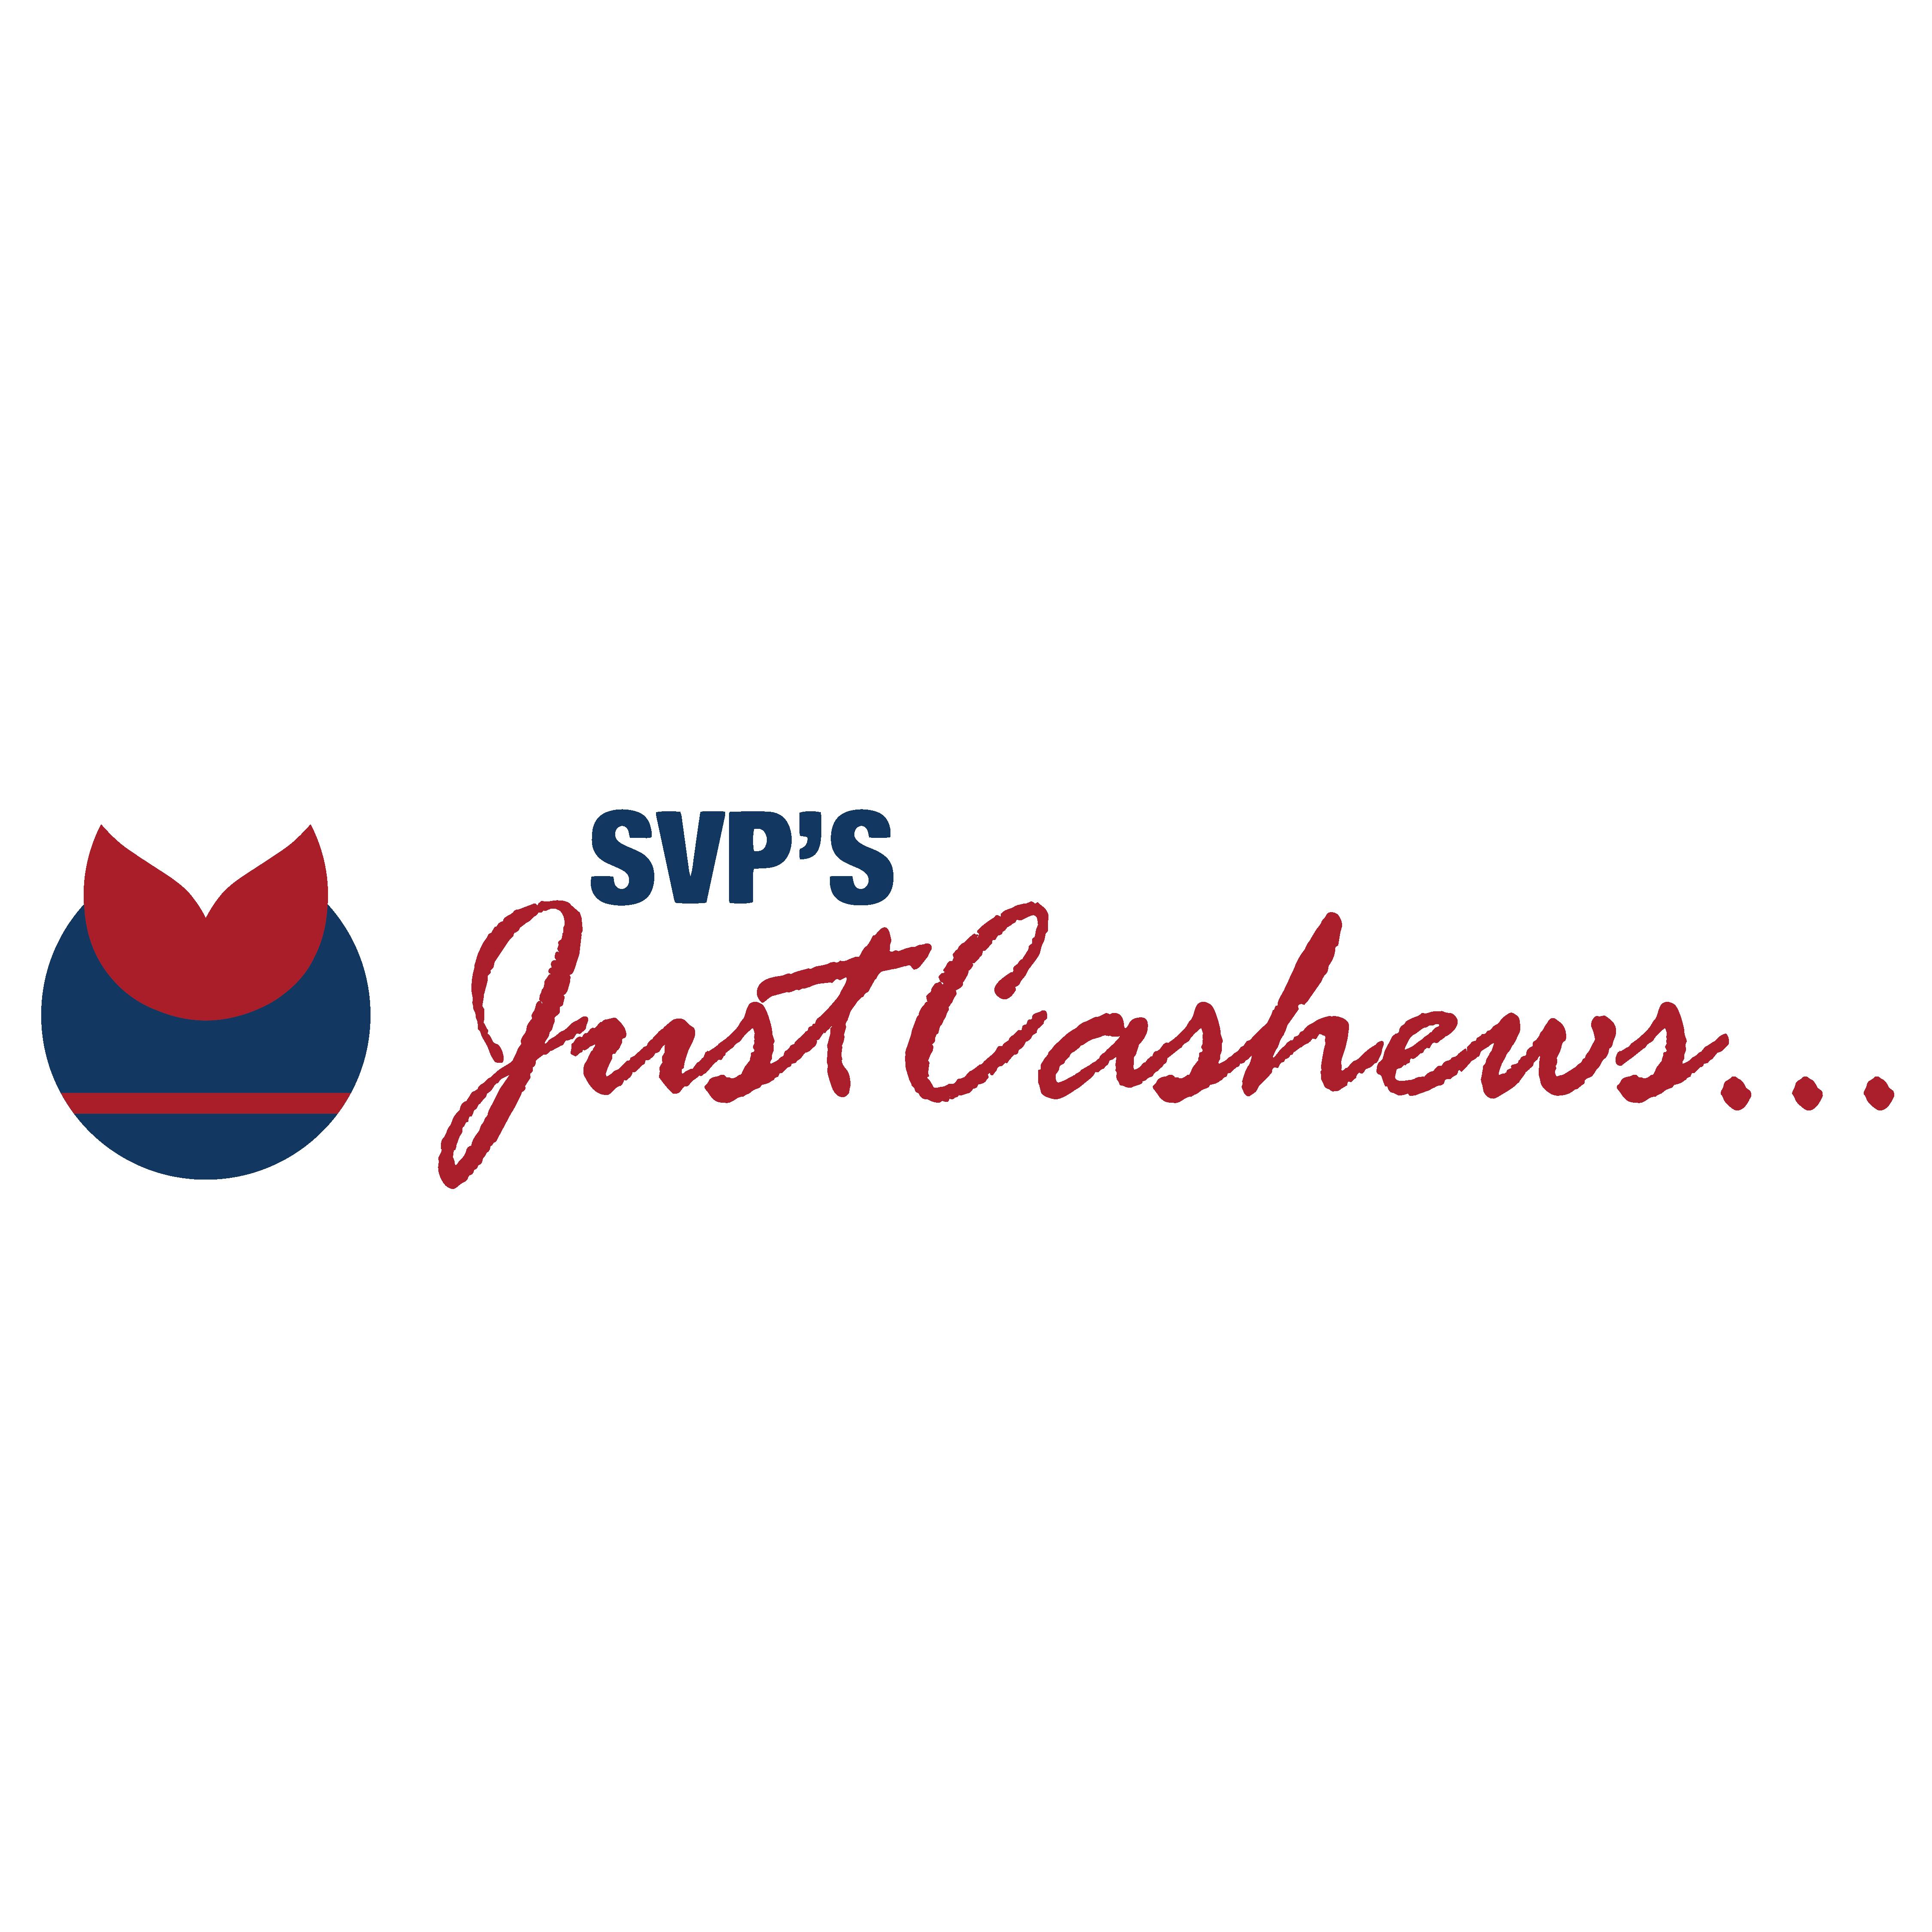 SVP's Just Cashews